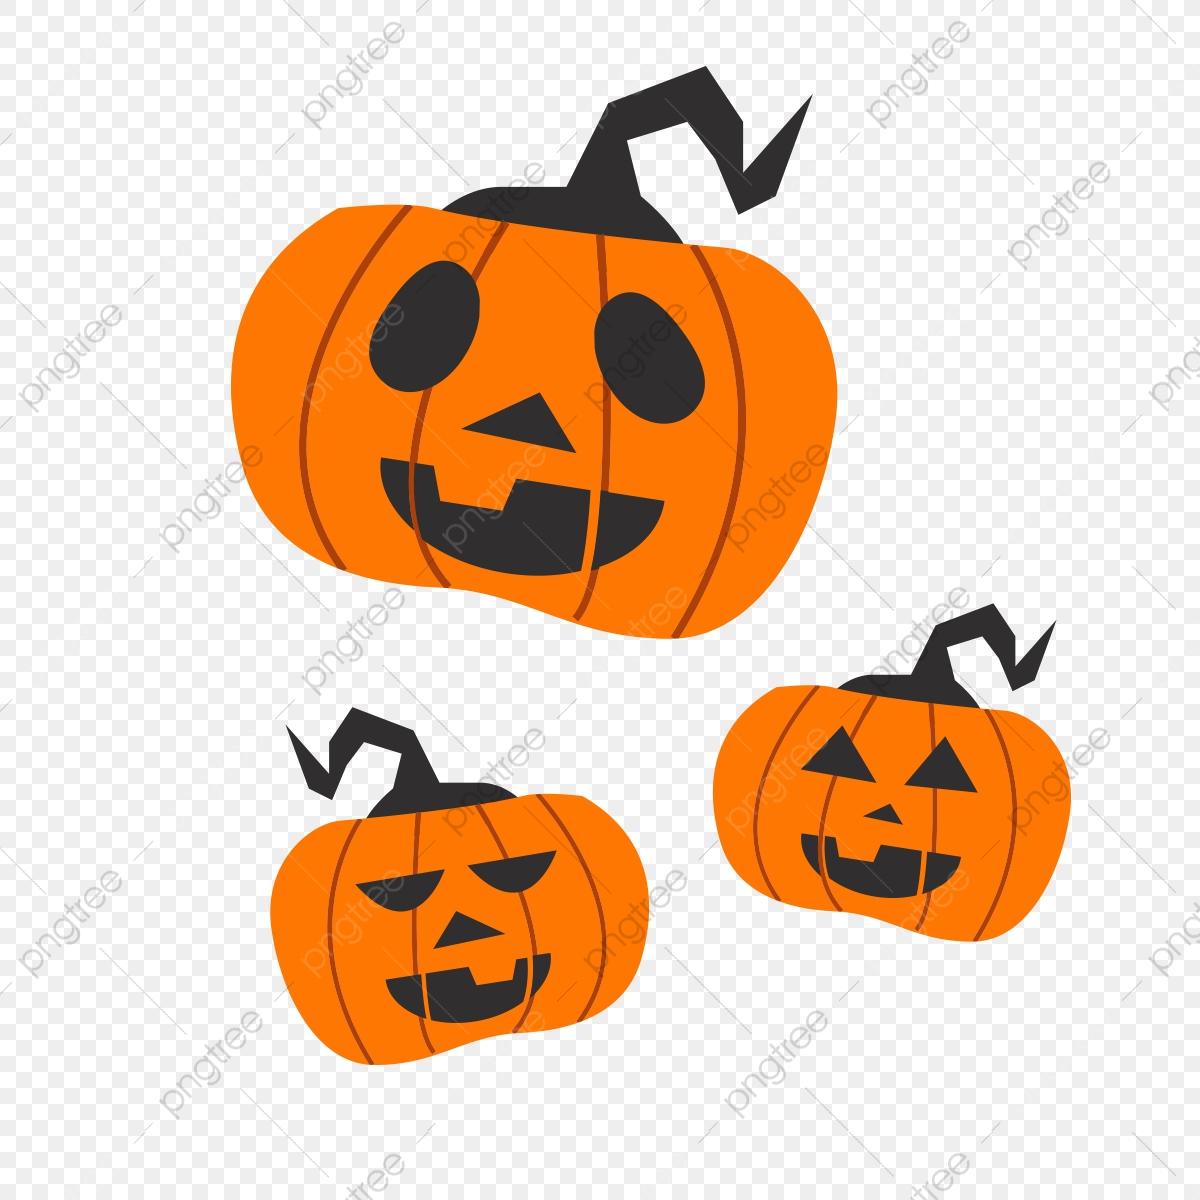 Simple Cartoon Halloween Design Pattern, Orange, Pumpkin